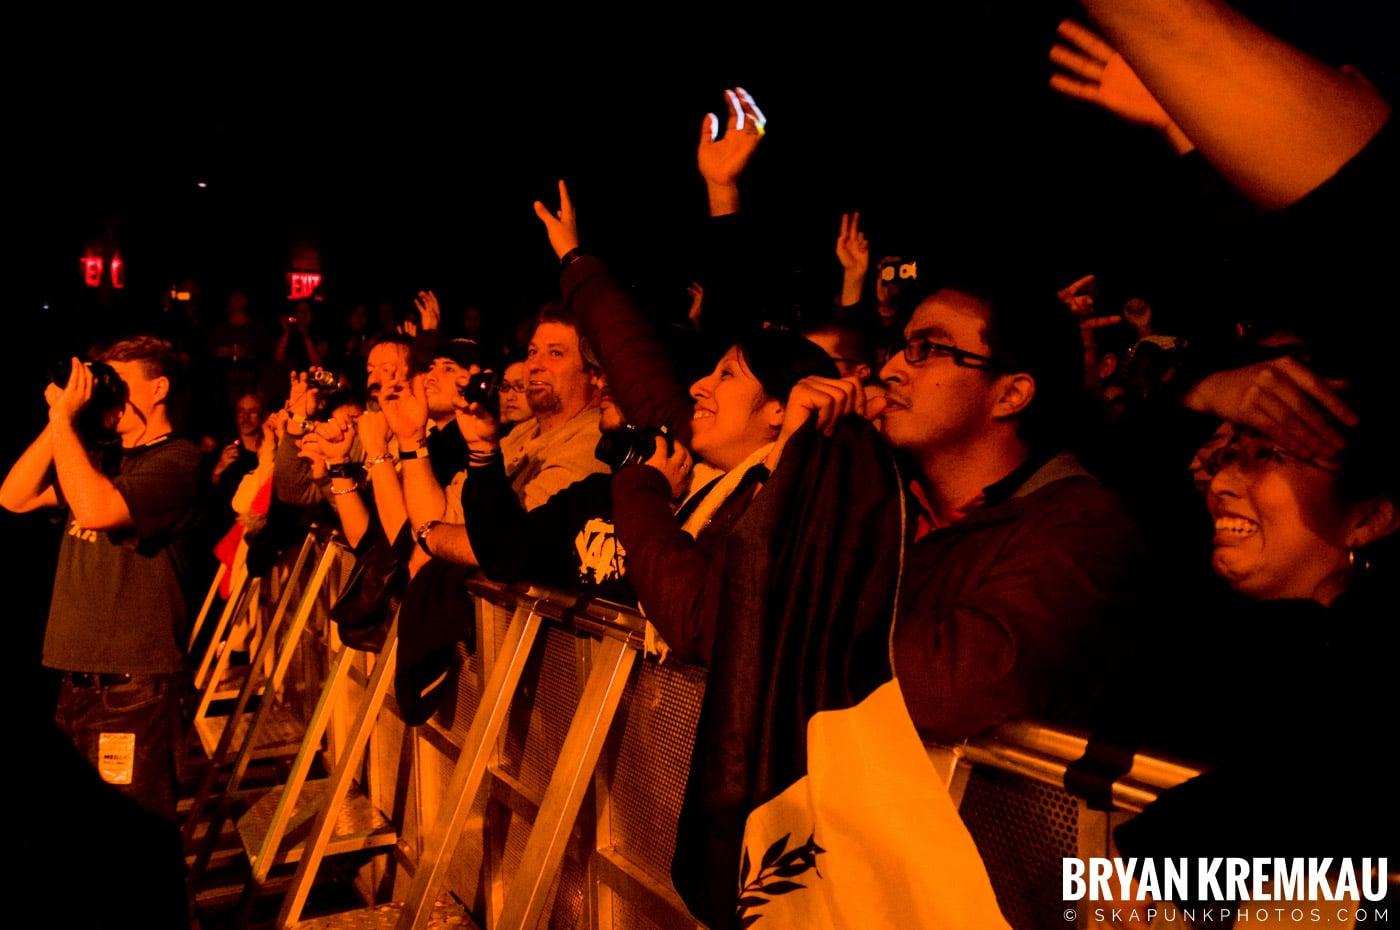 The Cranberries @ Nokia Theatre, NYC - 11.18.09 (11)